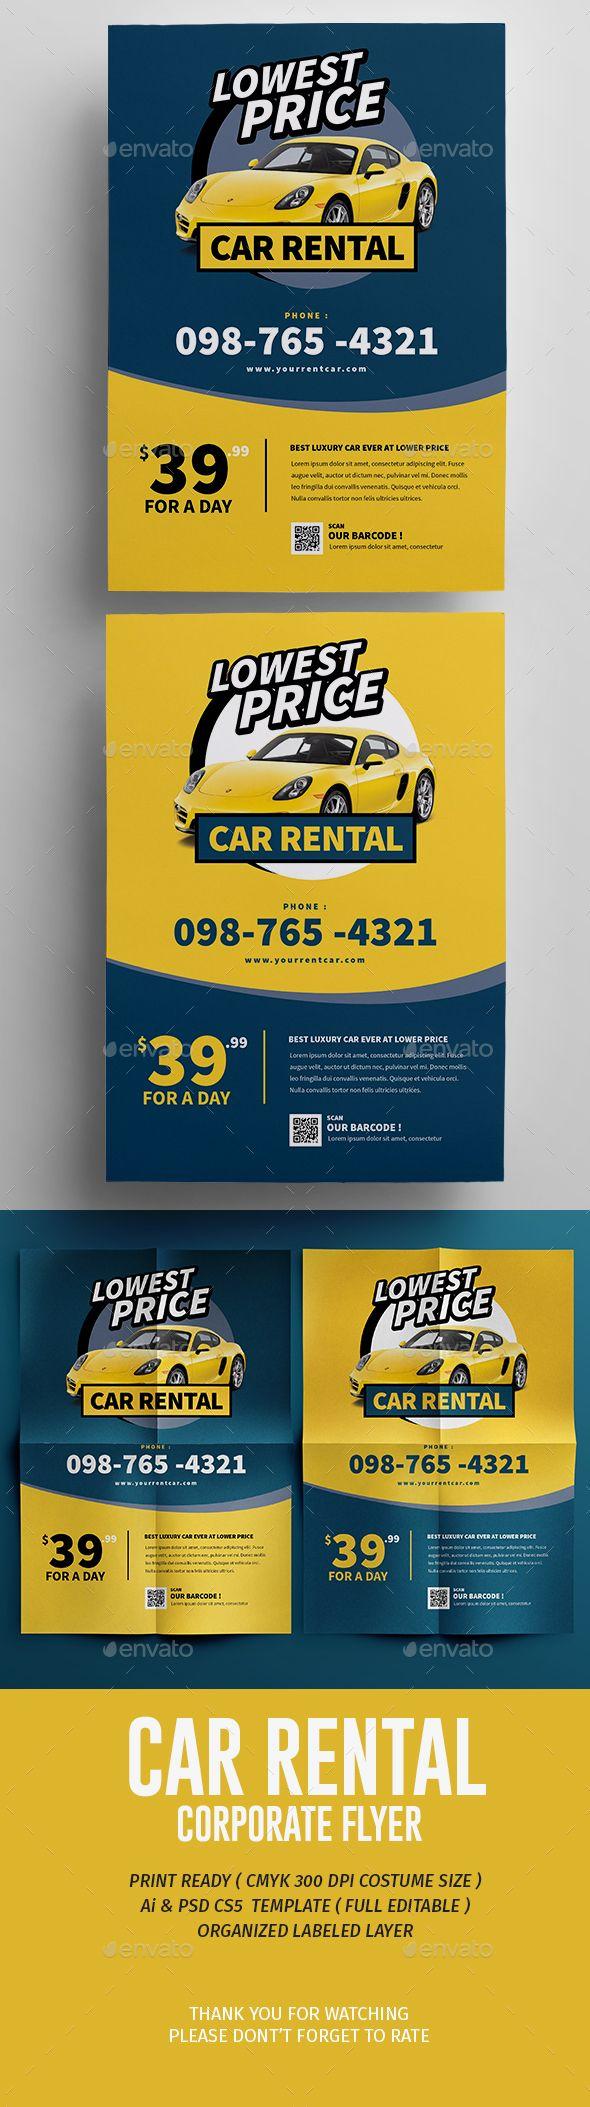 Car Rental Flyer - Corporate #Flyers Download here: https://graphicriver.net/item/car-rental-flyer/17429331?ref=classicdesignp